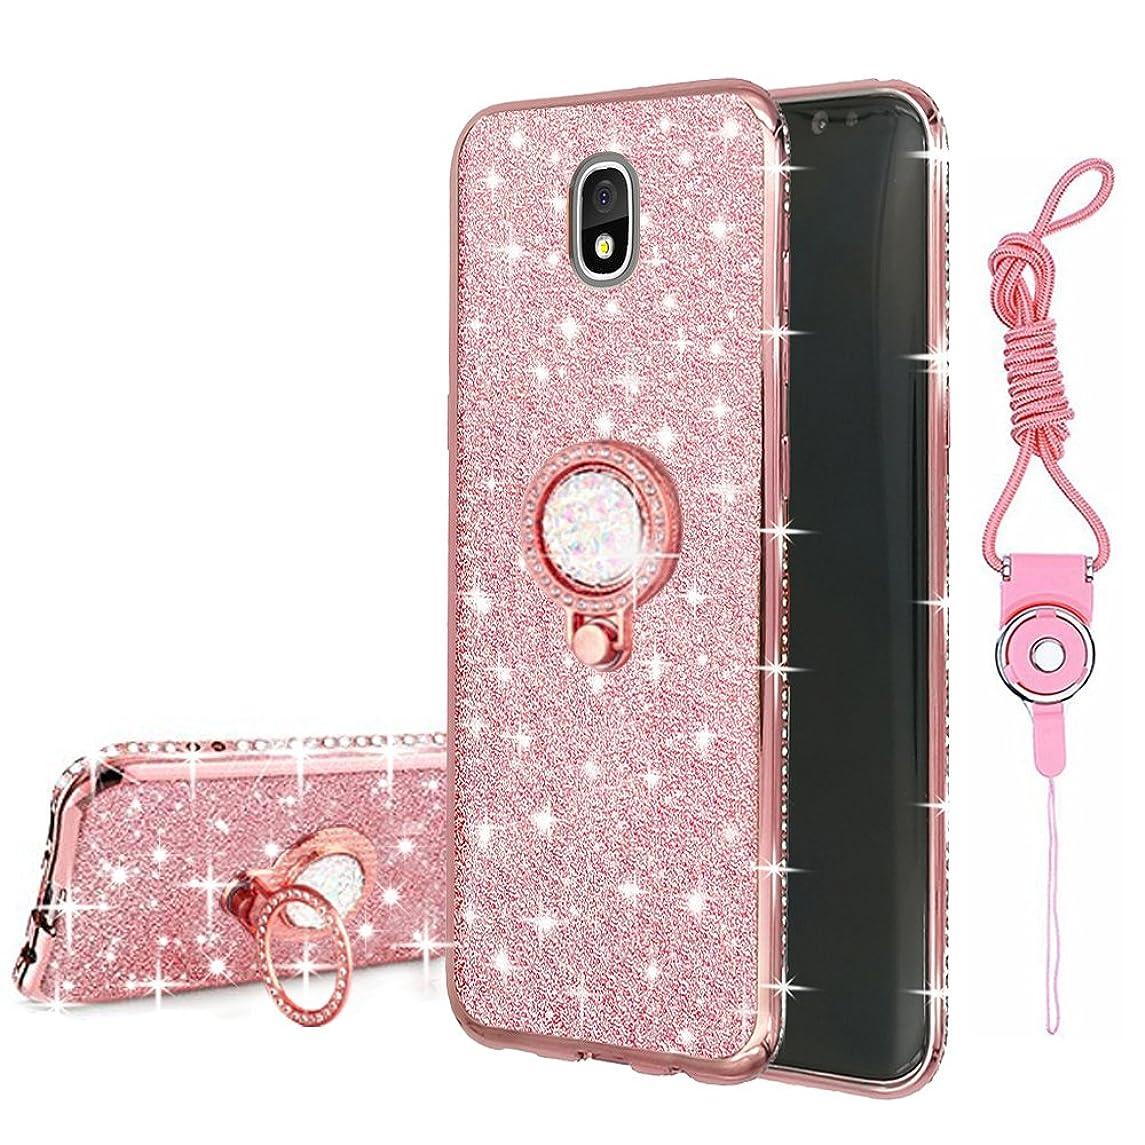 Galaxy J7 2018 Case,Galaxy J7 Aero/J7 Top/J7 Crown/J7 Star/J7 V 2nd Gen/J7 Aura/J7 Refine/J7 Eon Case, ZHFLY Bling Glitter Sparkle Diamond Silicone Clear Case Cover for Samsung Galaxy J7 2018,Rose